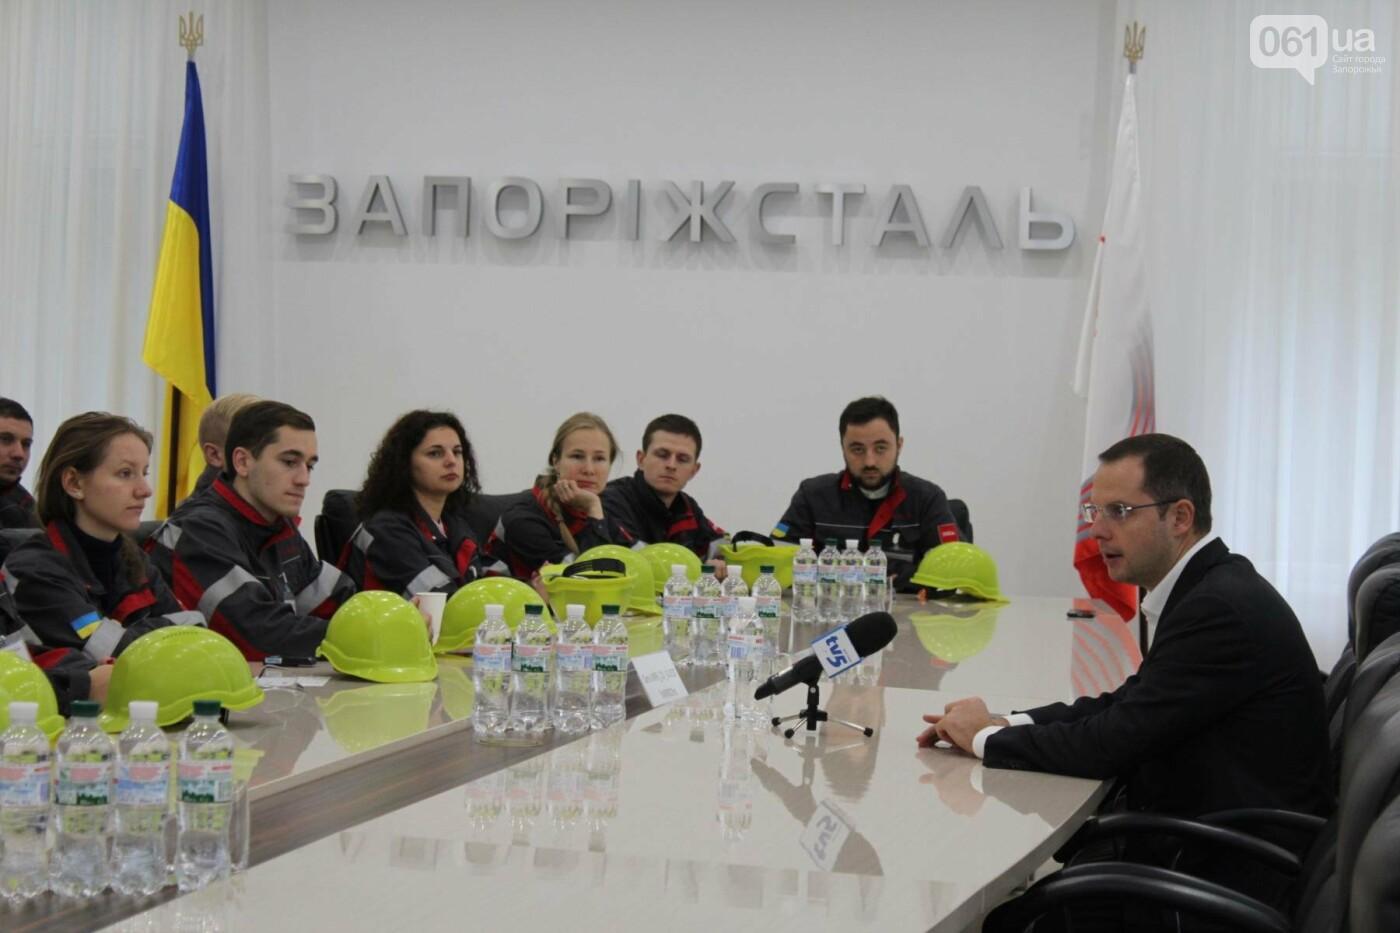 «Це вражаюче, правда»: студенты со Львова посетили производство комбината «Запорожсталь», — ФОТОРЕПОРТАЖ, фото-1